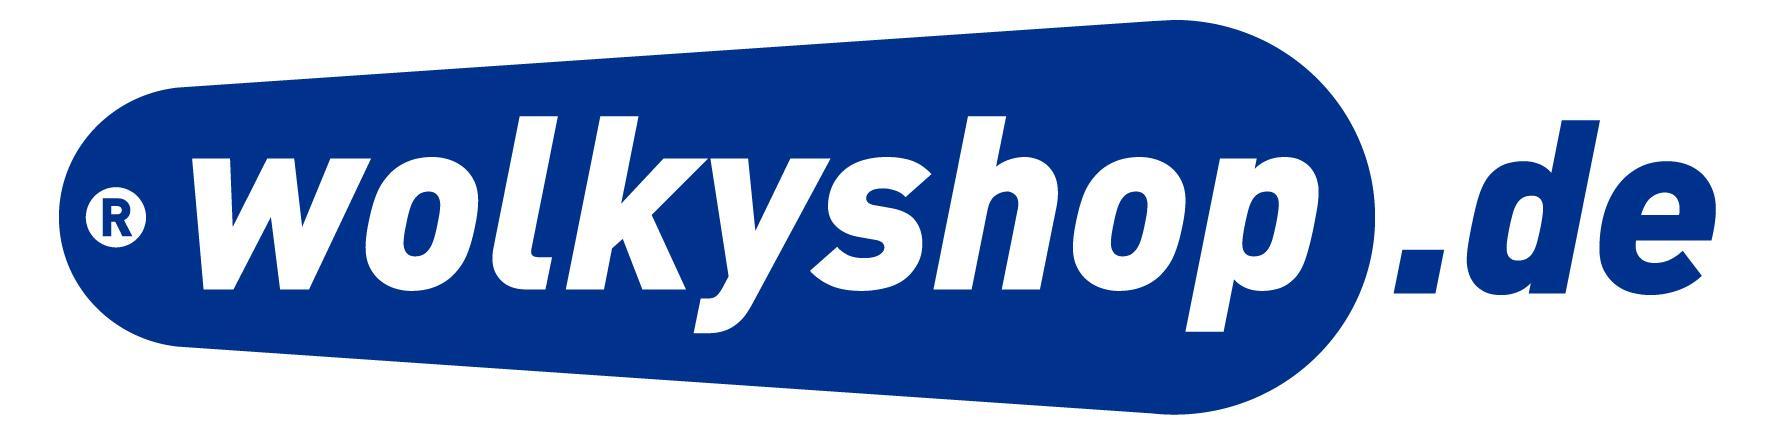 wolkyshop.de- Logo - Bewertungen